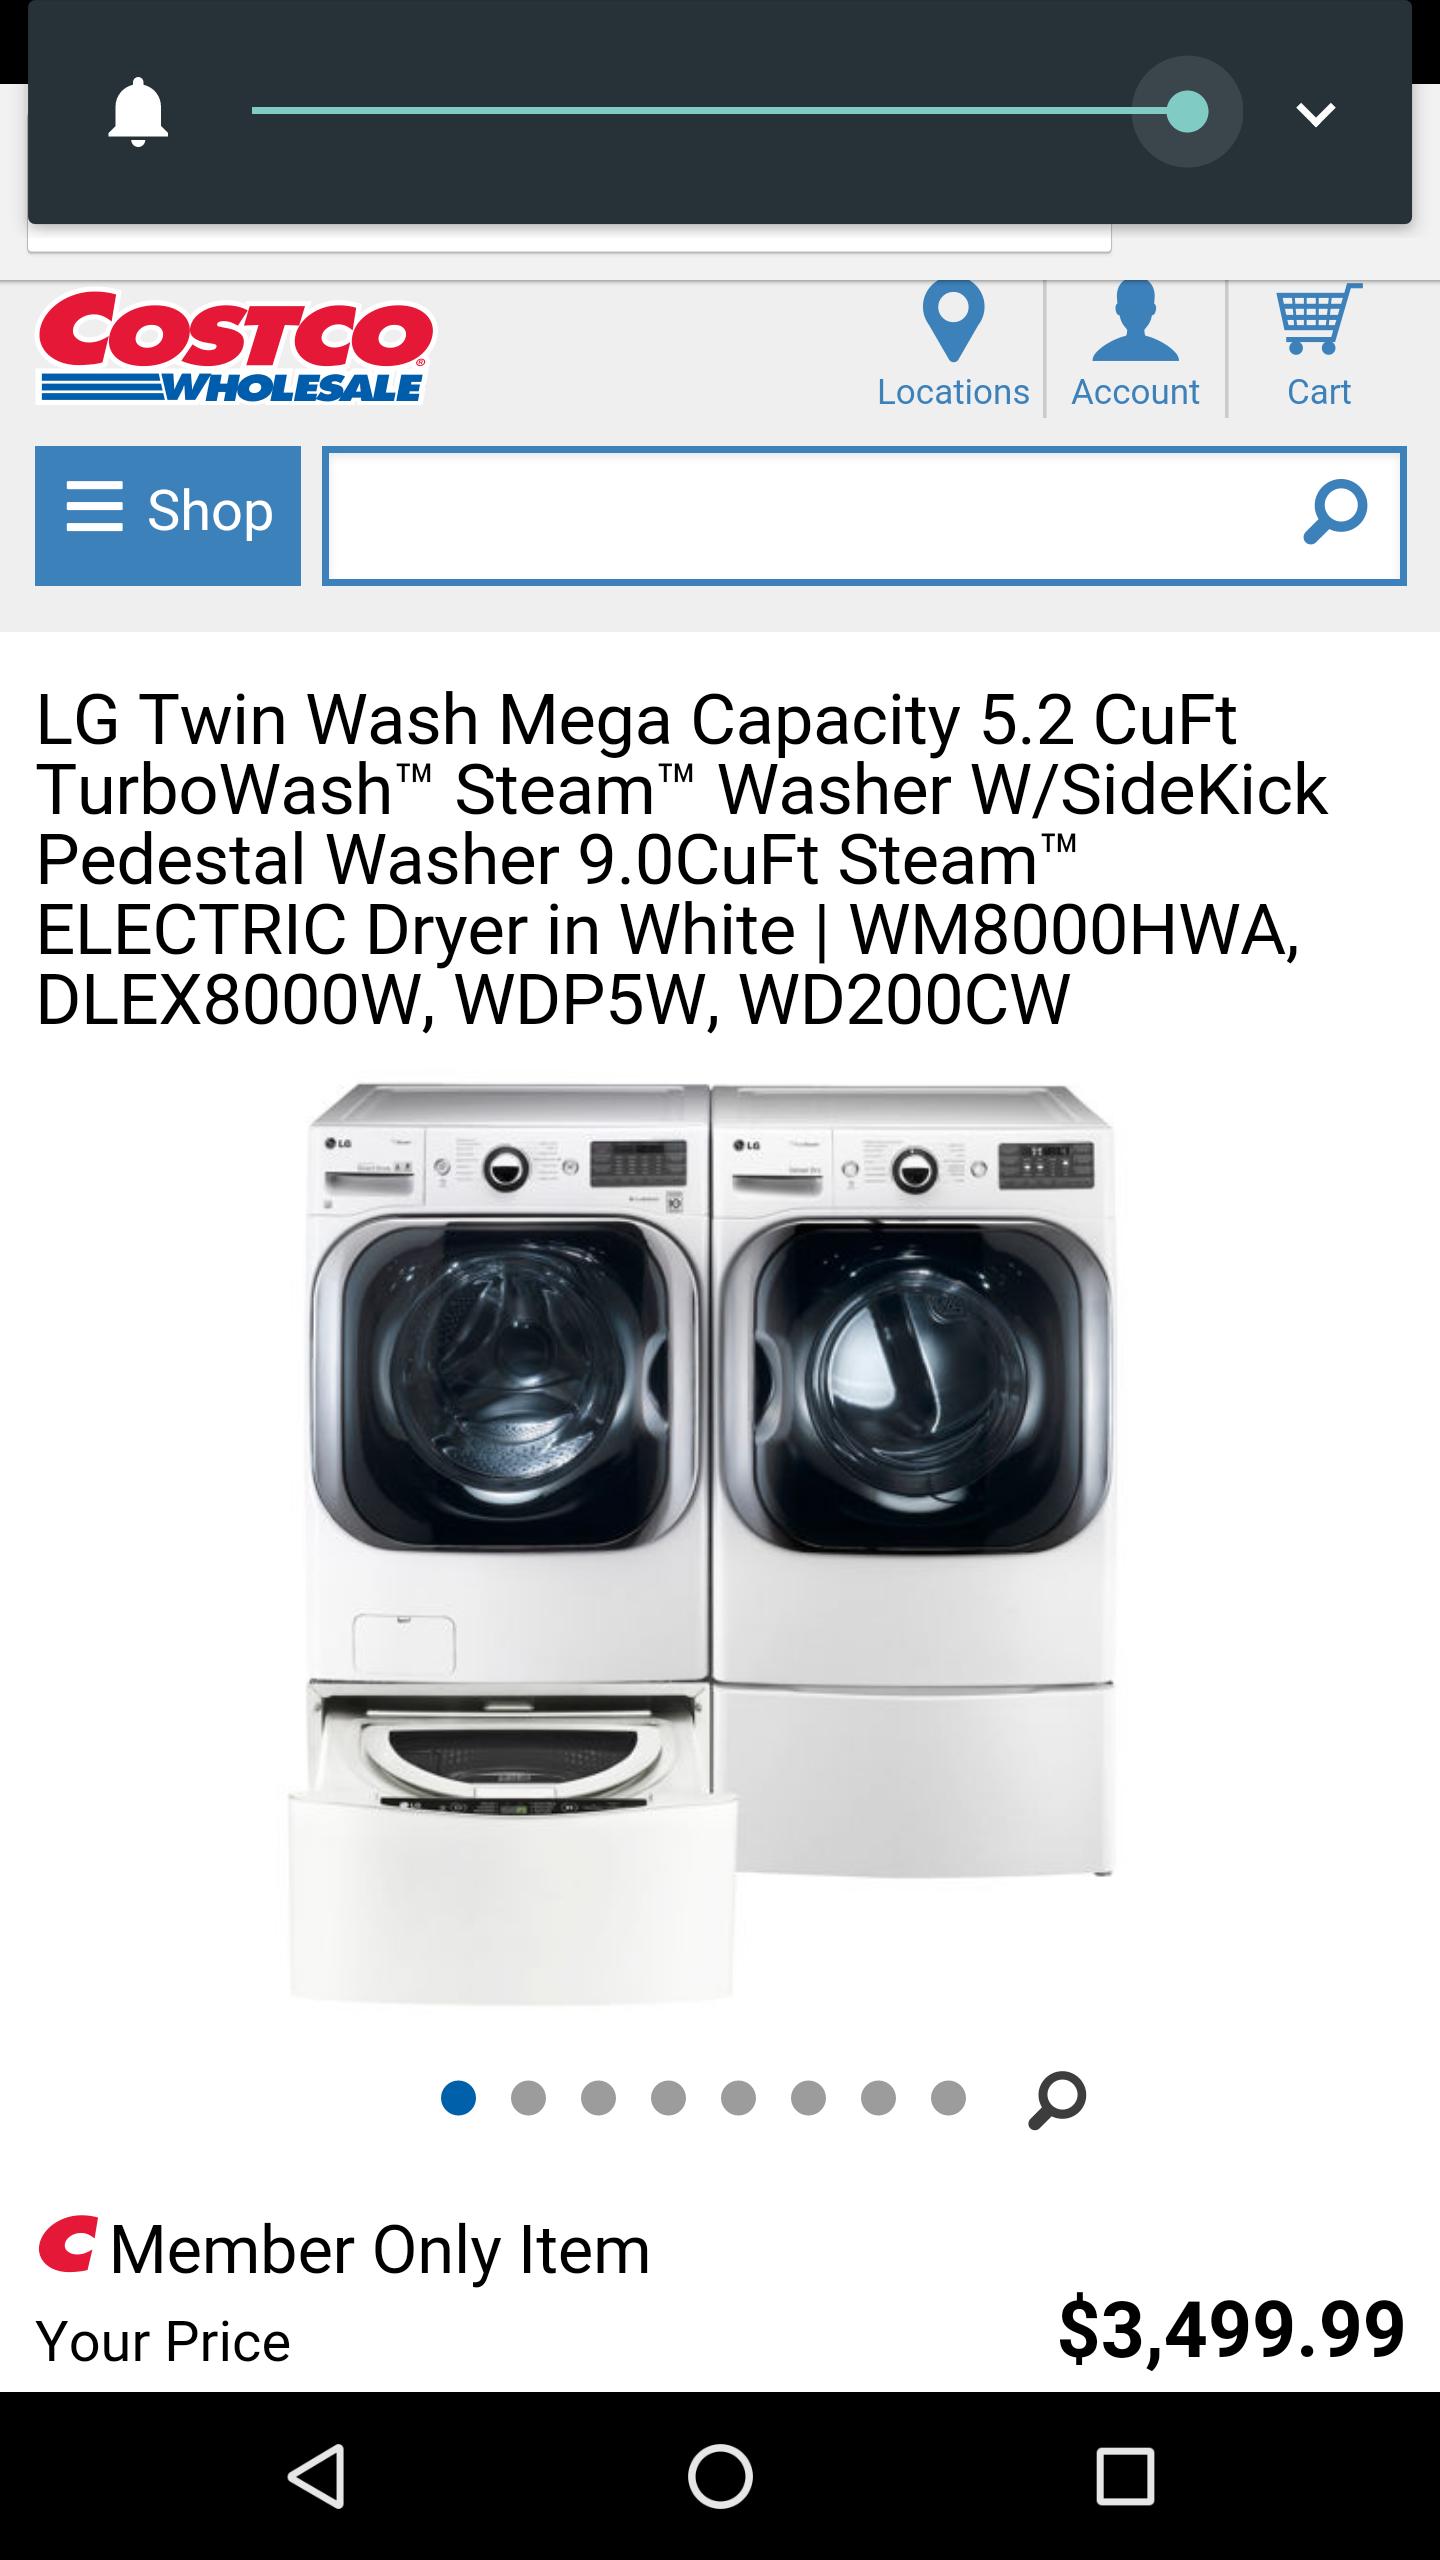 2400 Lg Twin Wash Mega Capacity 5 2 Cuft Turbowash Steam Washer W Sidekick Pedestal 9 0 Dryer Page Slickdeals